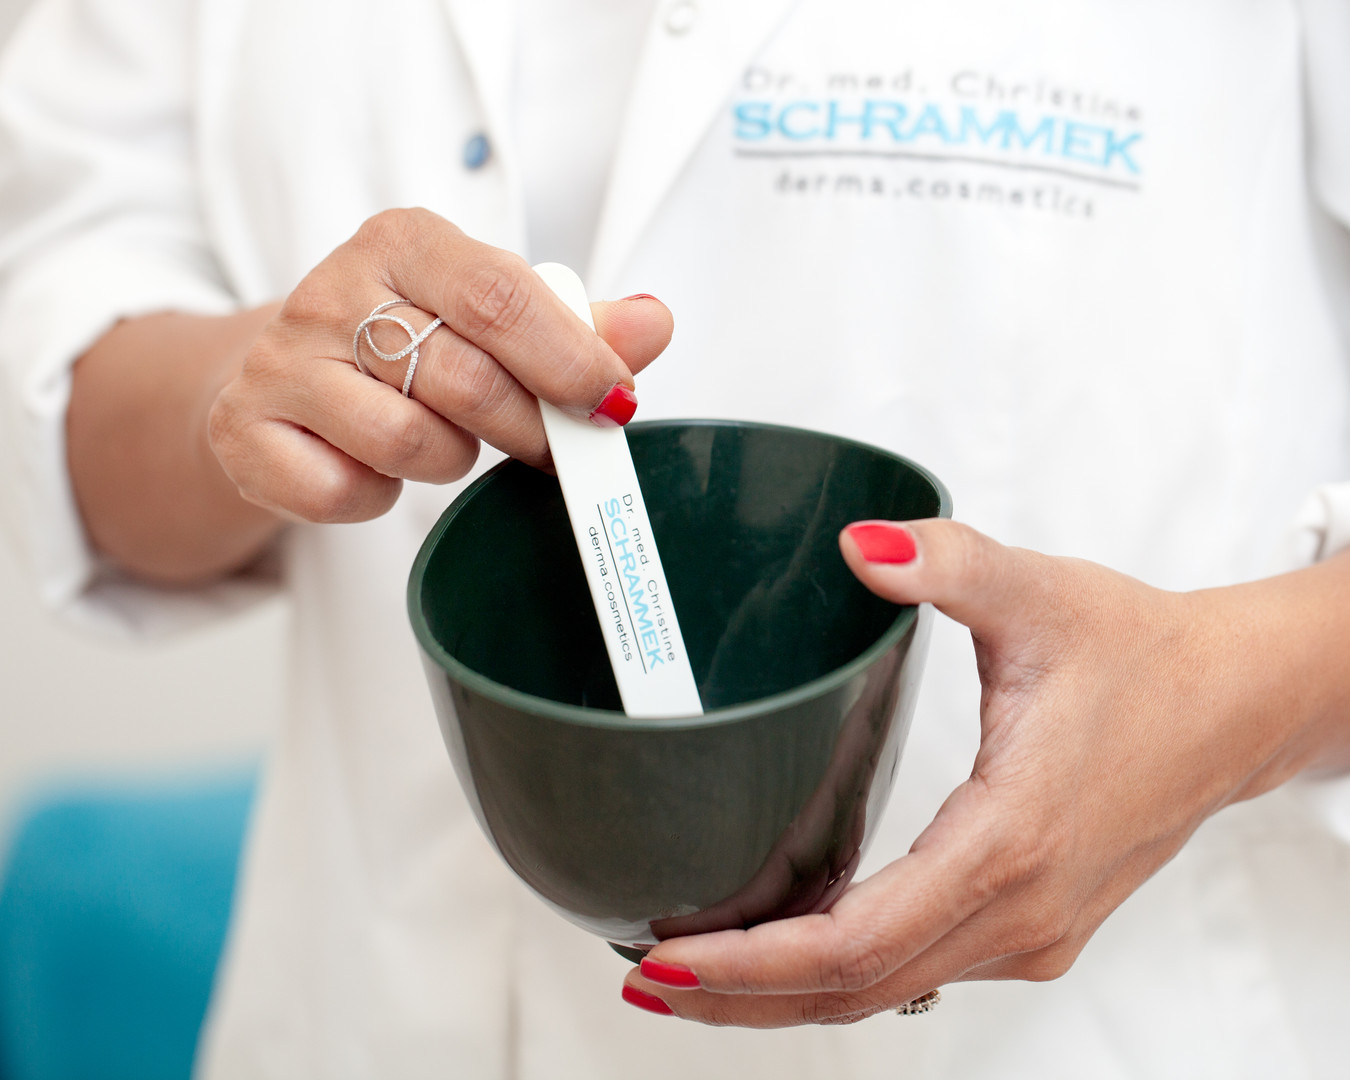 Health and Beauty Product Photography - Aqua Mer Spa Serum